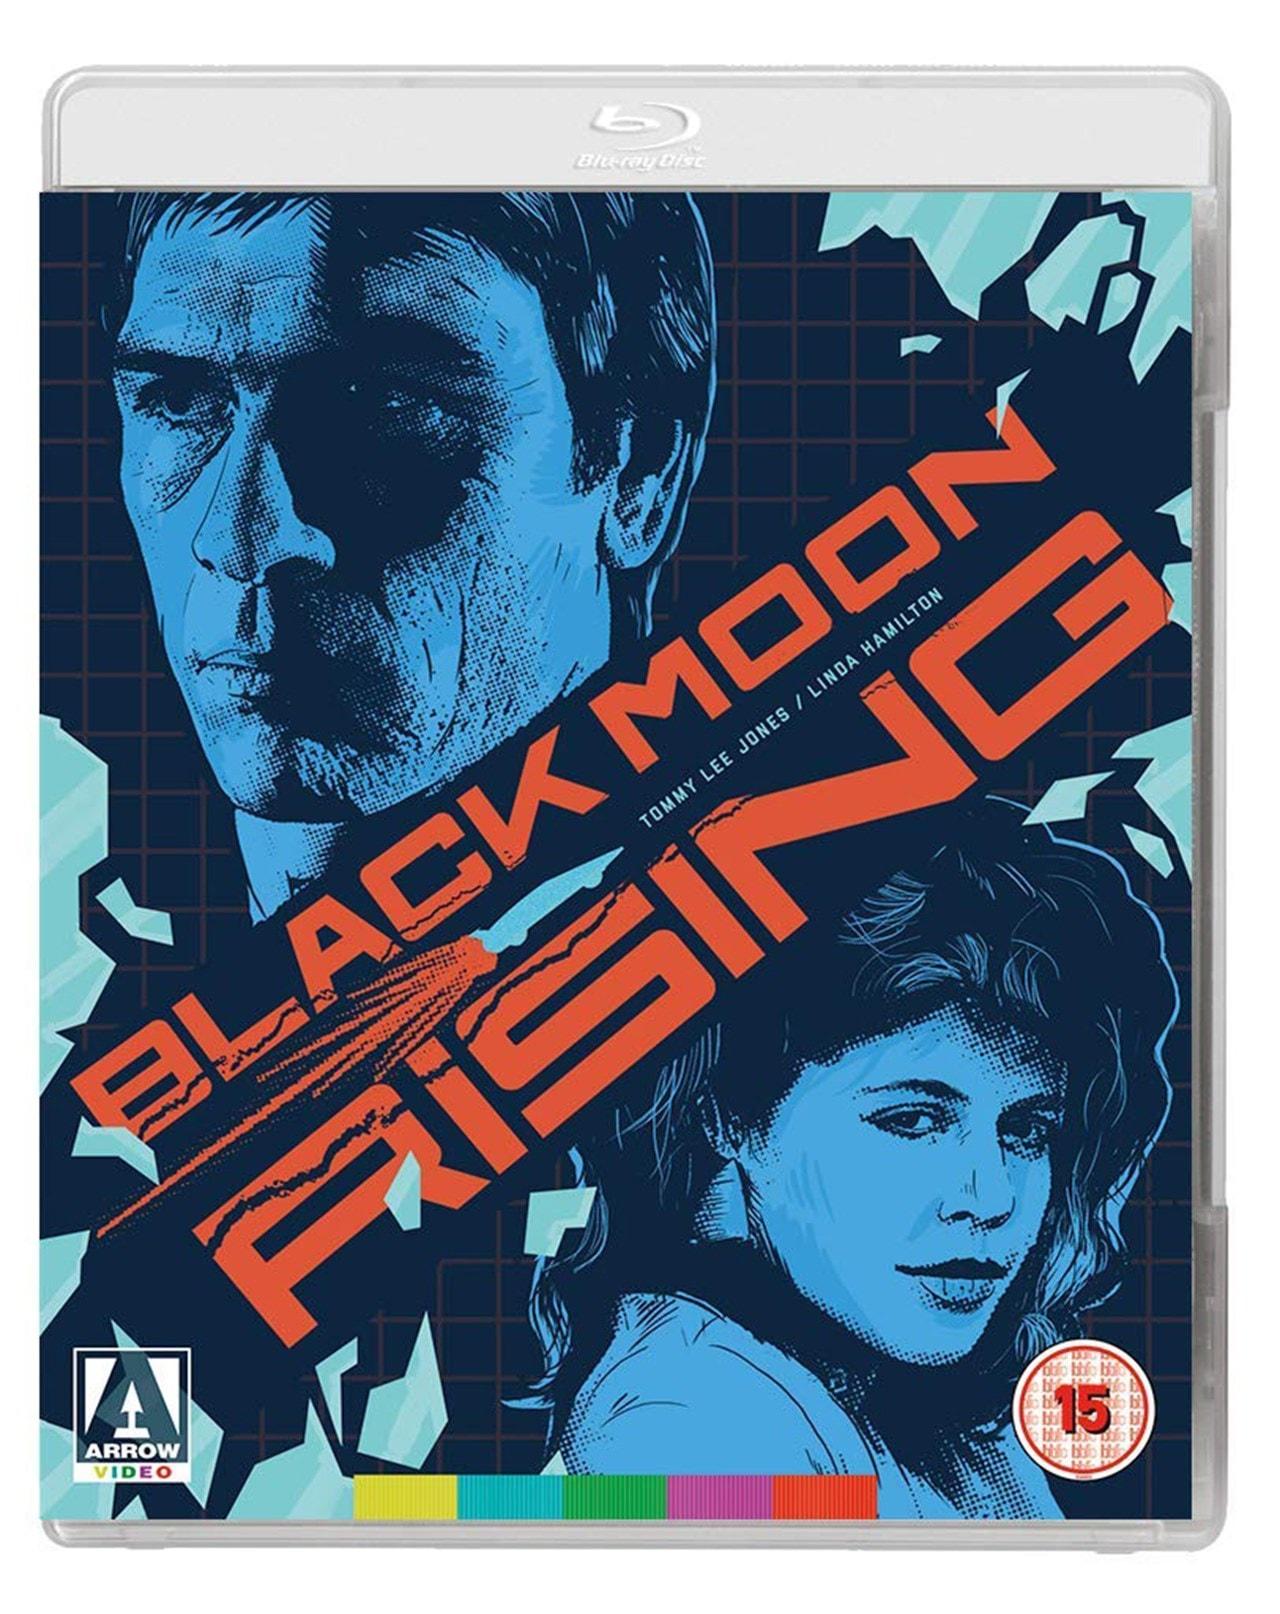 Black Moon Rising - 1